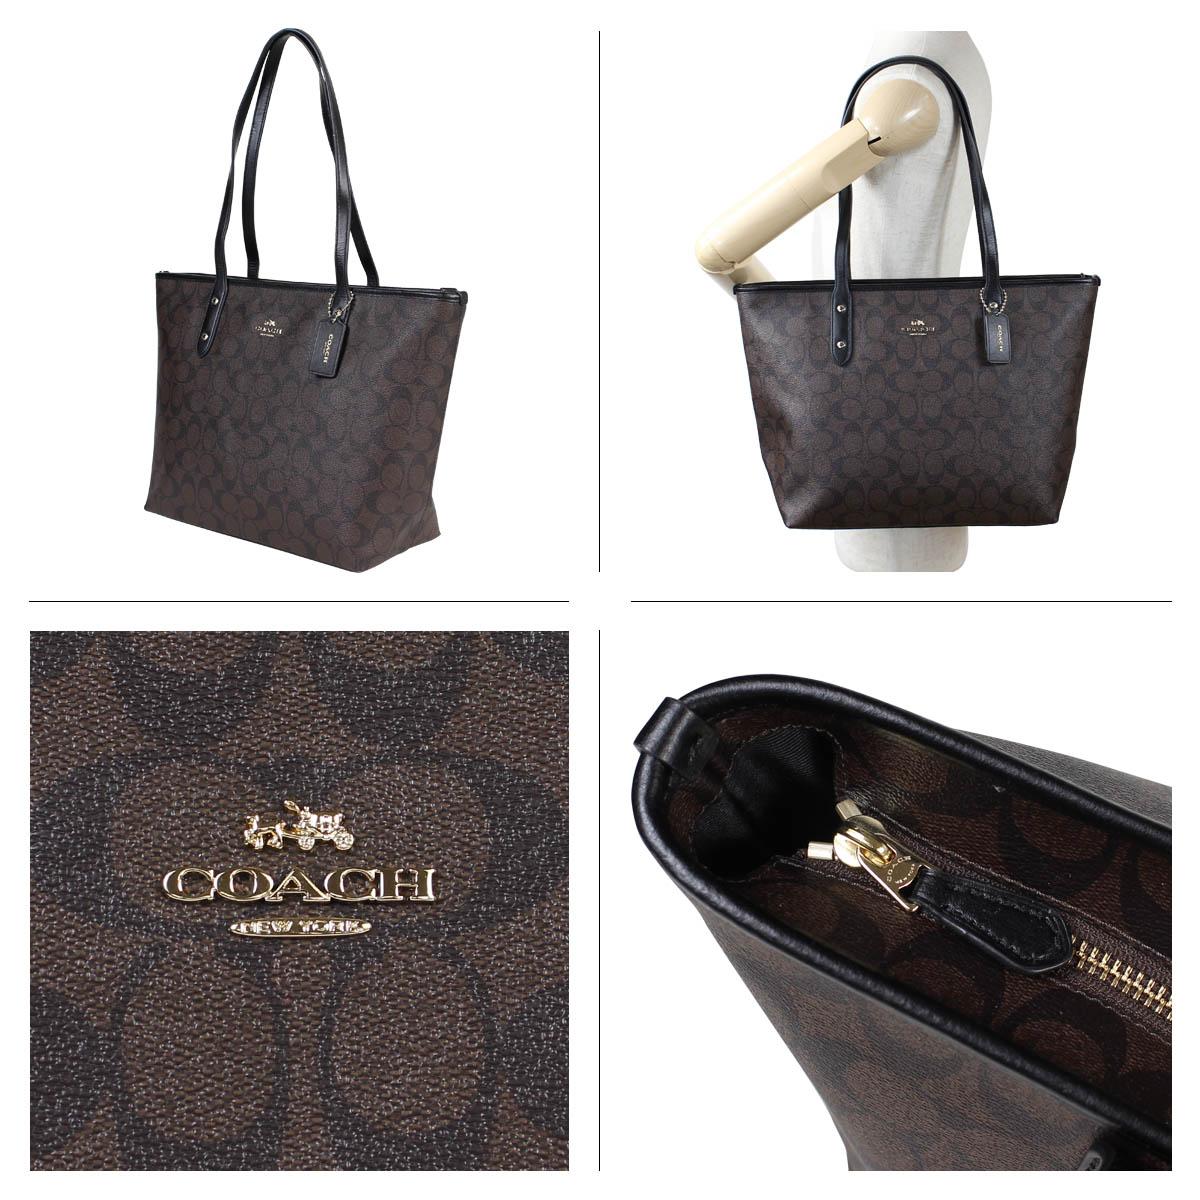 bd7eaf597 ... COACH coach bag tote bag Lady's CITY ZIP TOTE IN SIGNATURE F58292 brown  ...